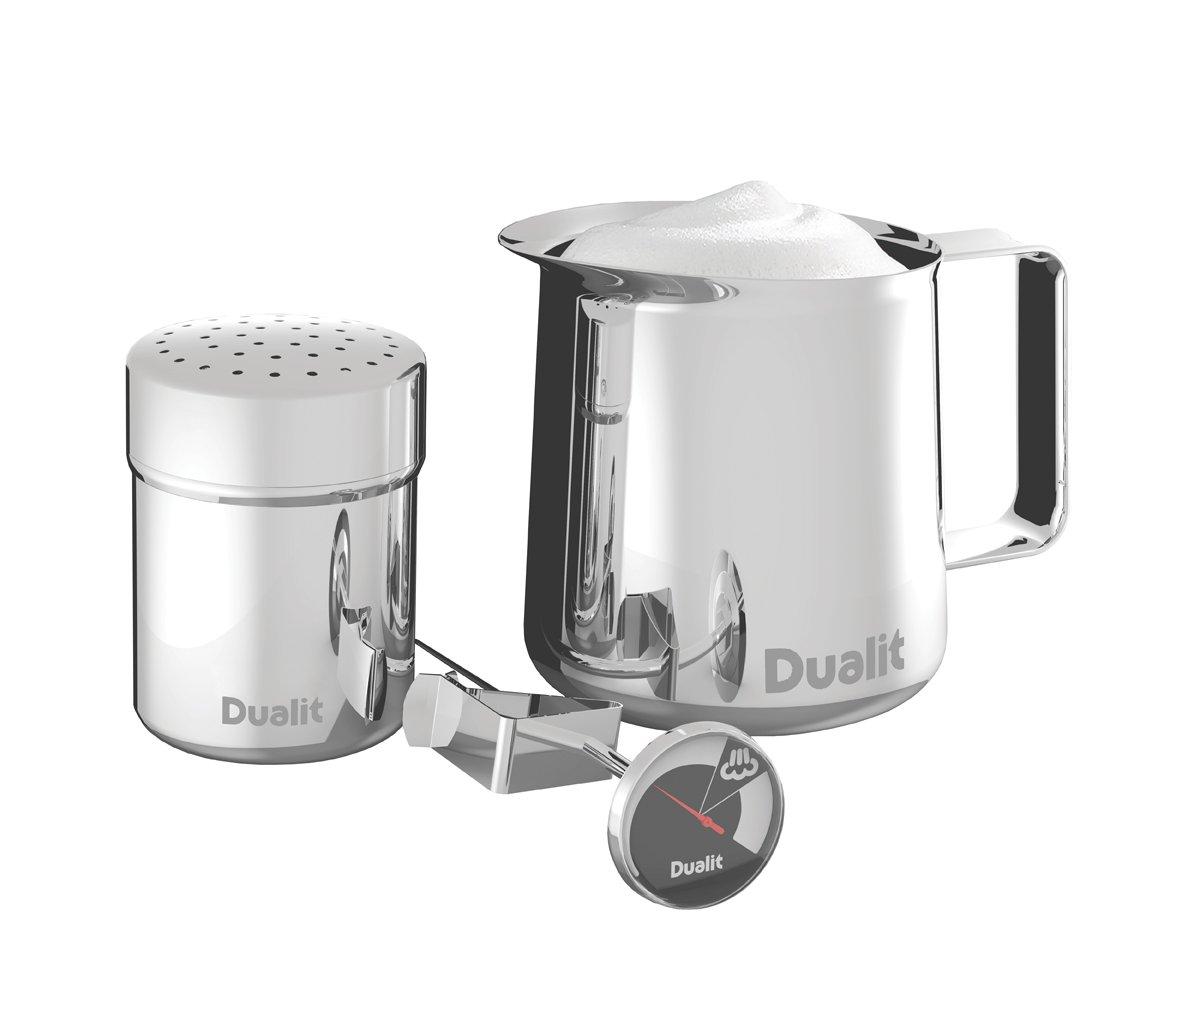 Dualit Barista Coffee Kit Stainless Steel 85100